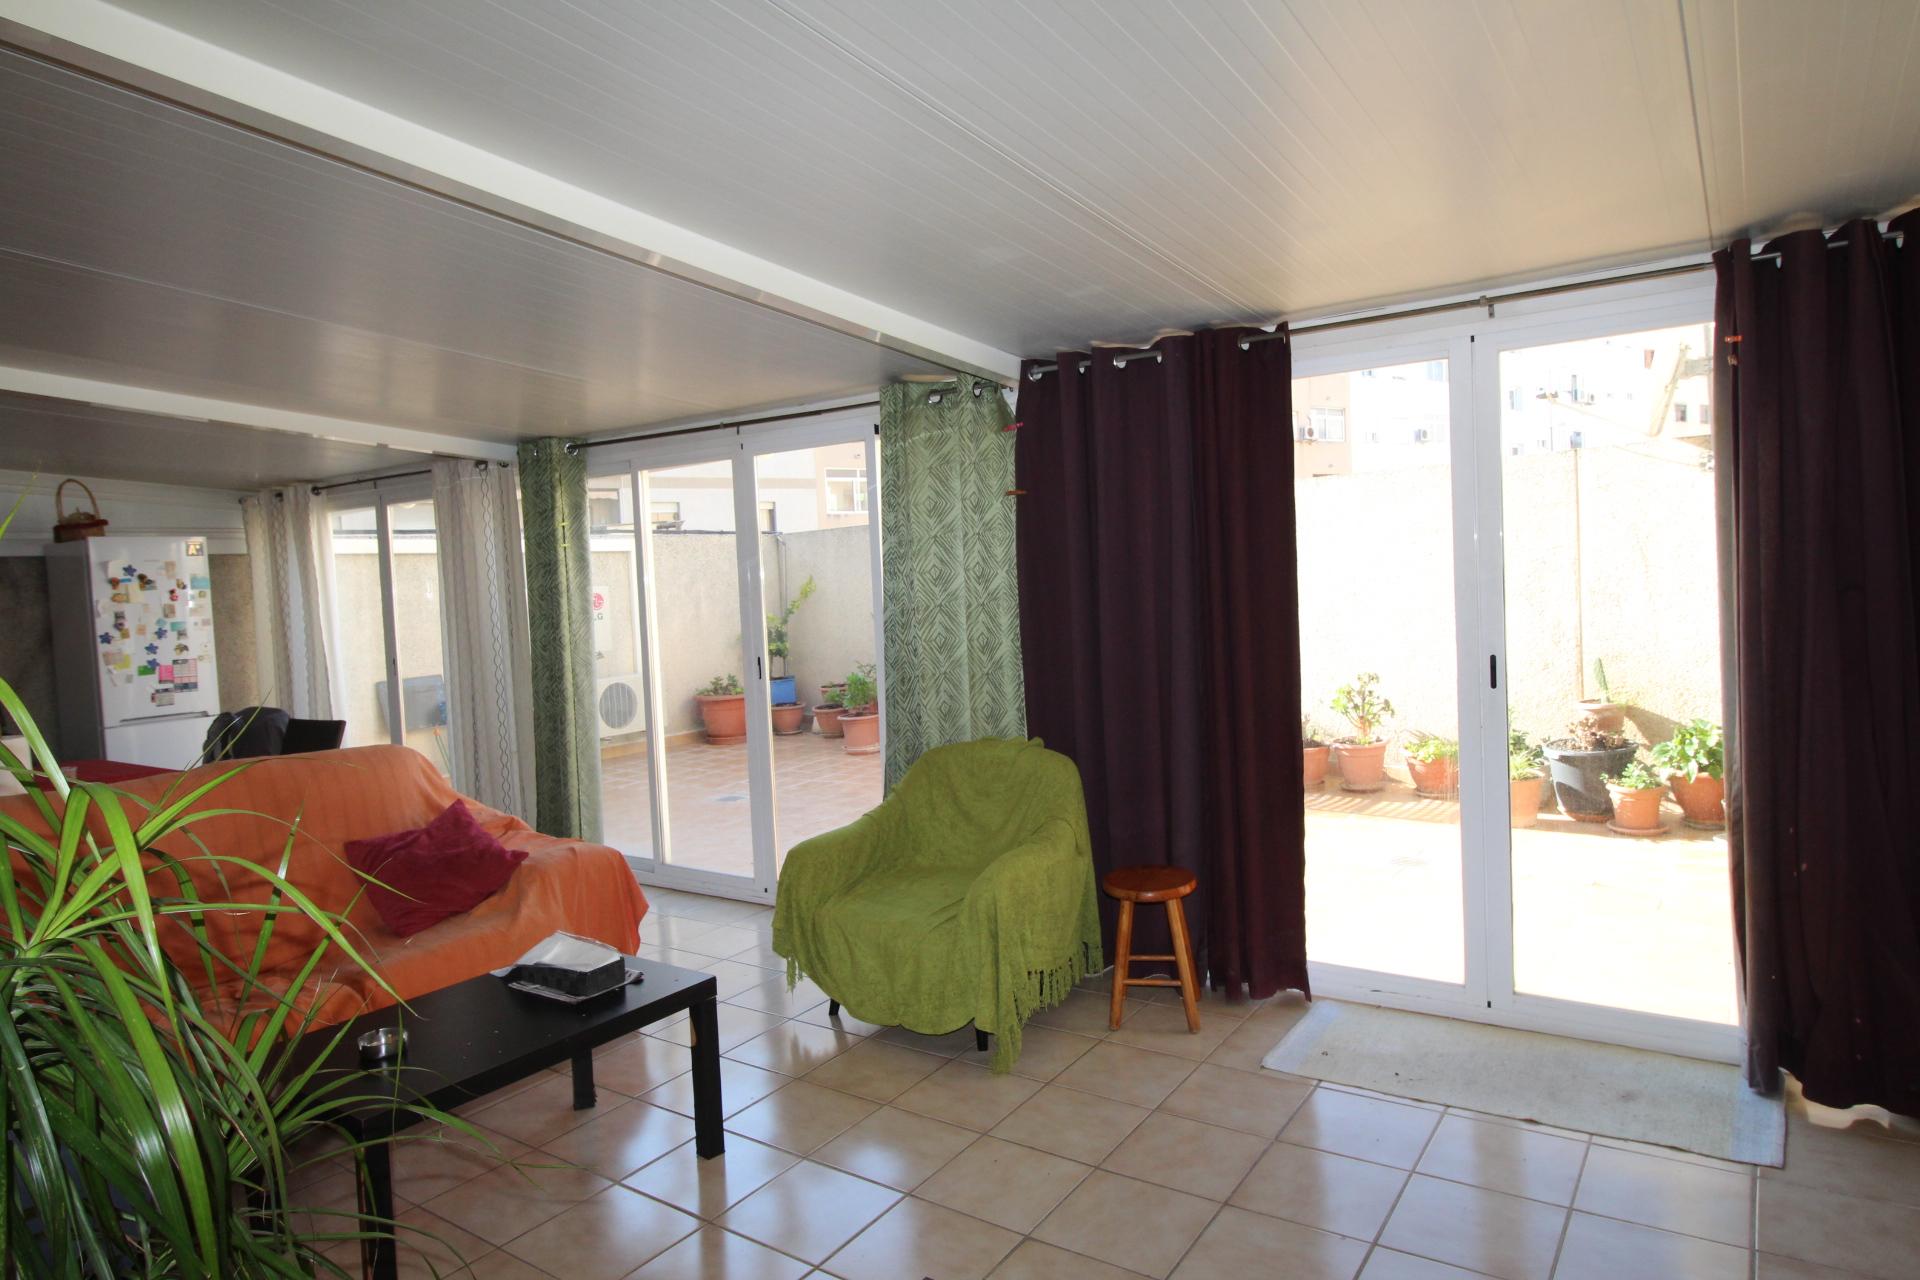 2561-2 Carretera Valldemossa